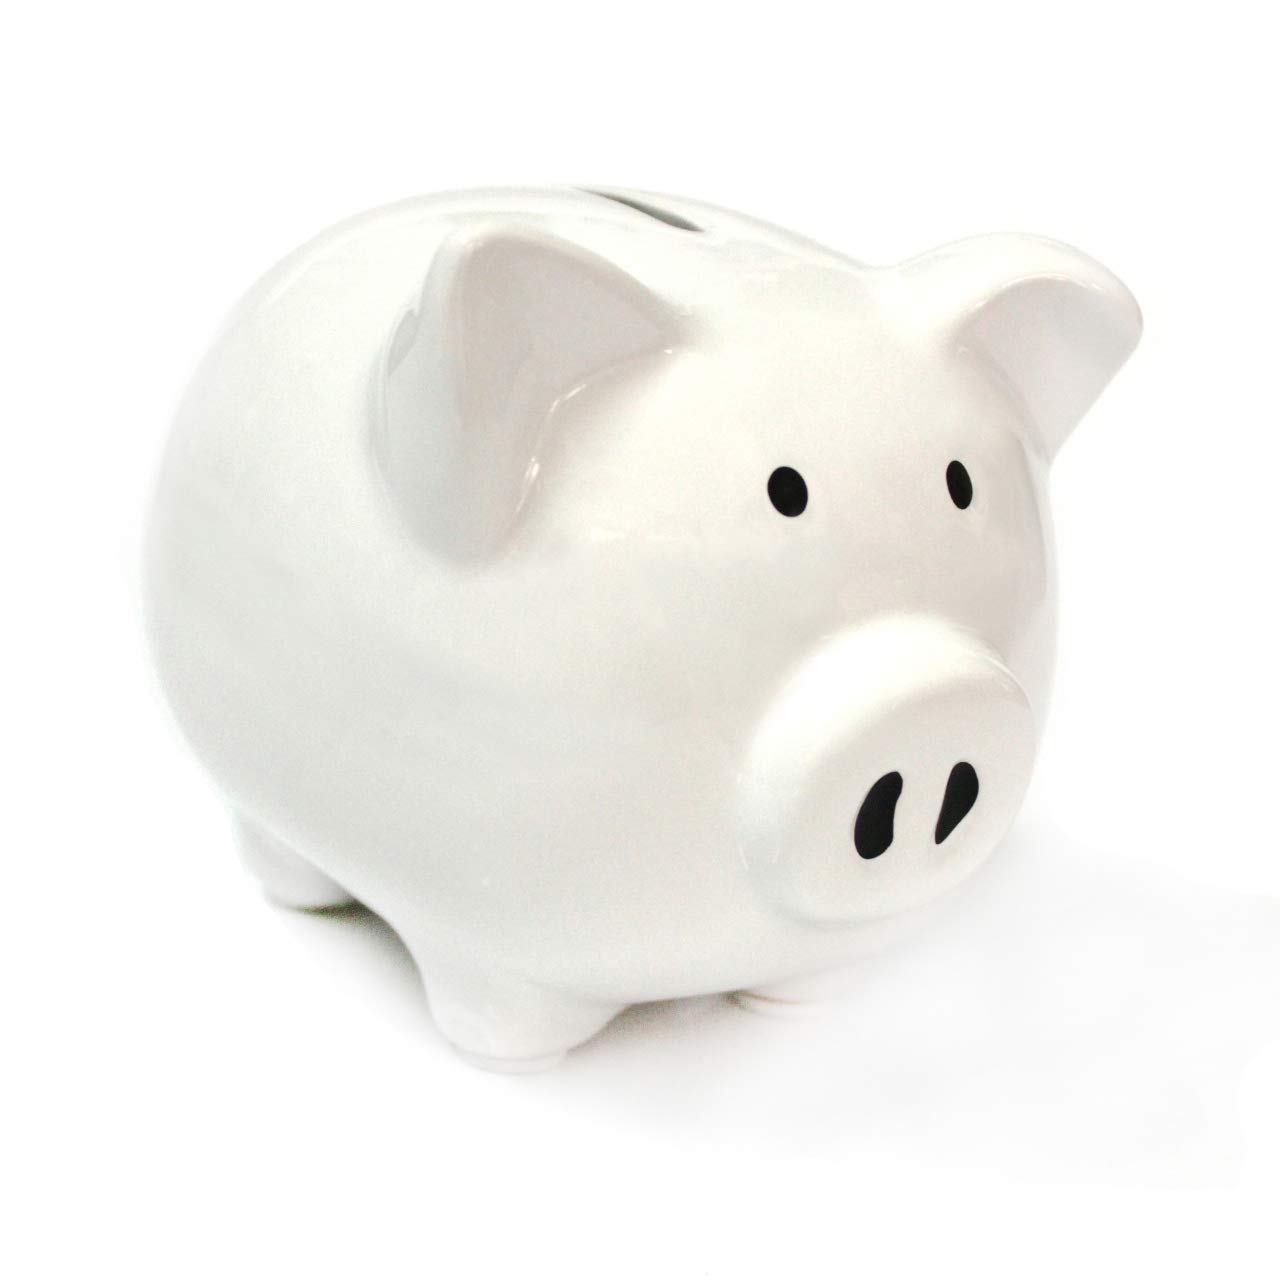 White Piggy Bank, Piggy Bank for Girls Boys Kids Piggy Banks A New Piggy Banks for Gift(White)